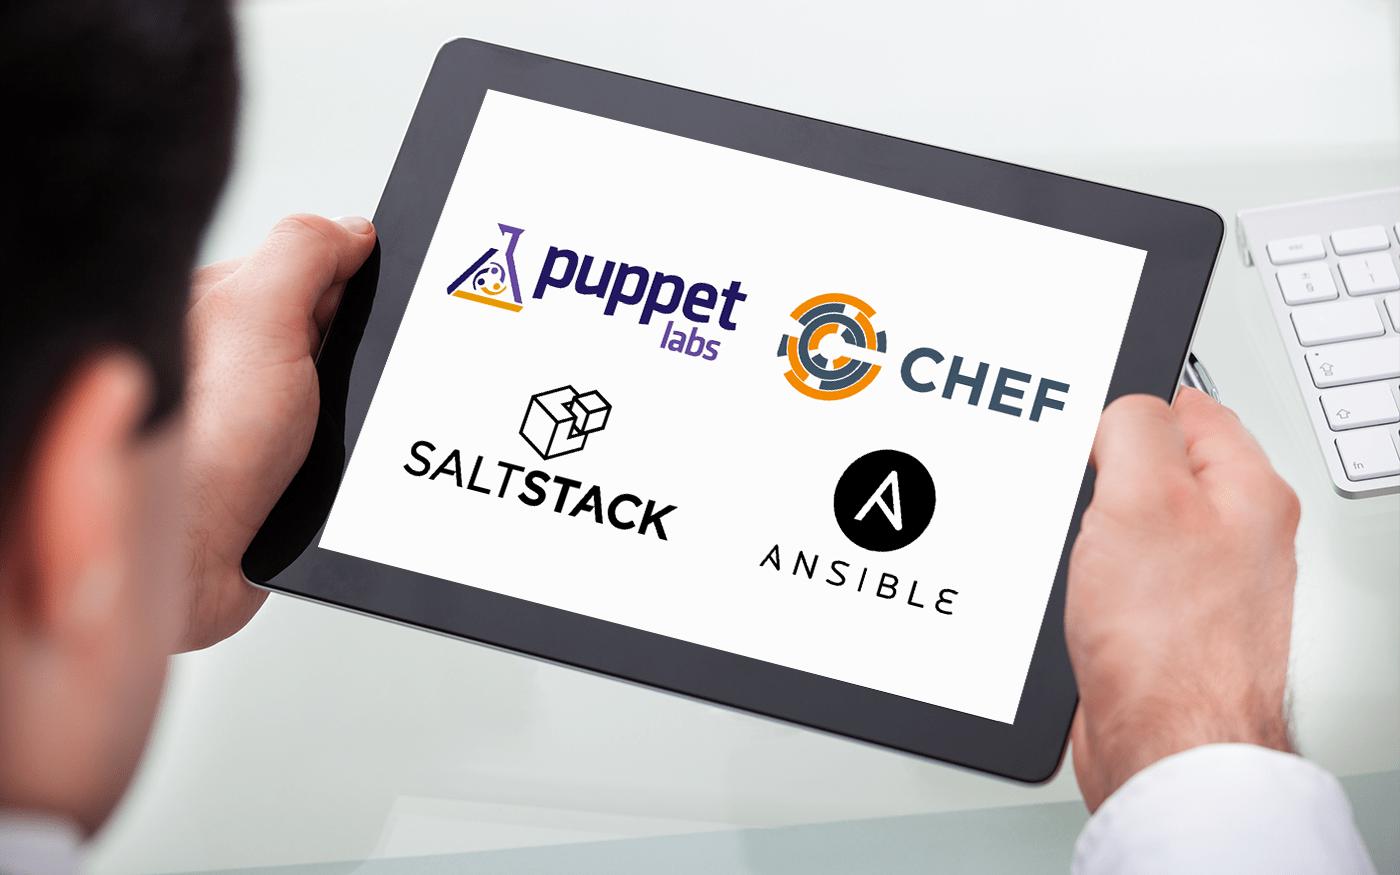 Chef vs. Puppet vs. Ansible vs. Saltstack: A Complete Comparison